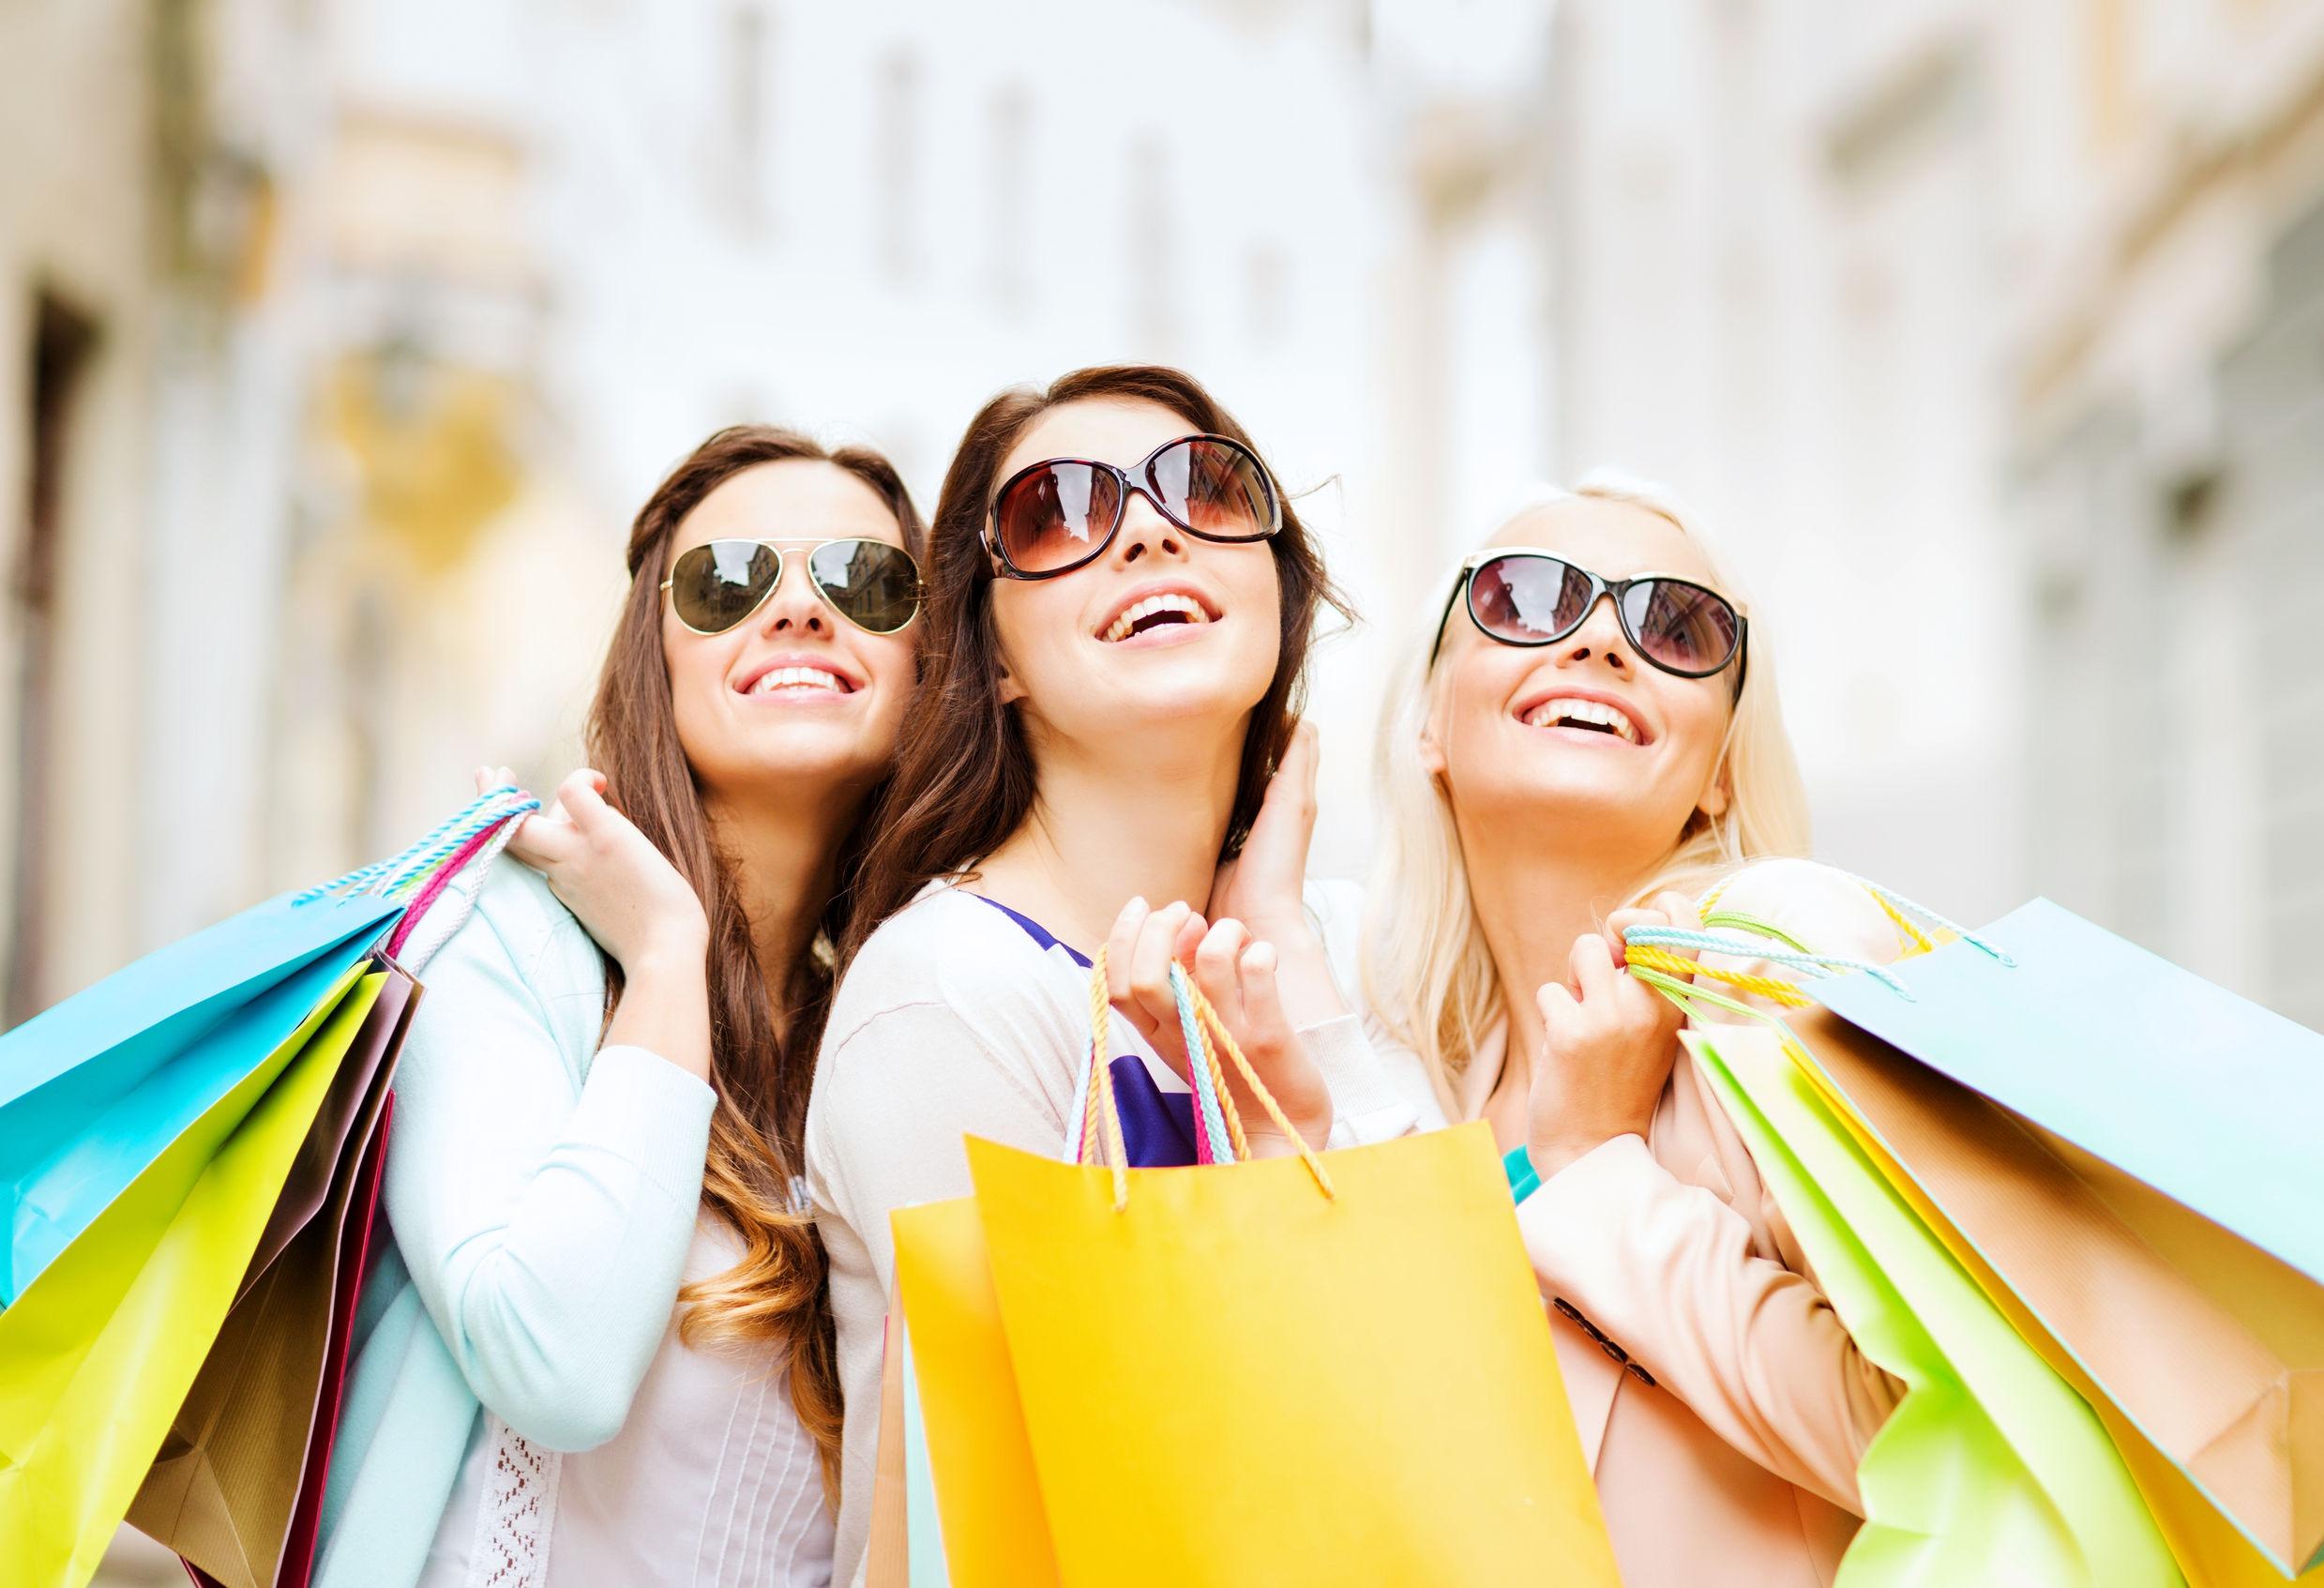 Shopping-ul, terapie pentru femei